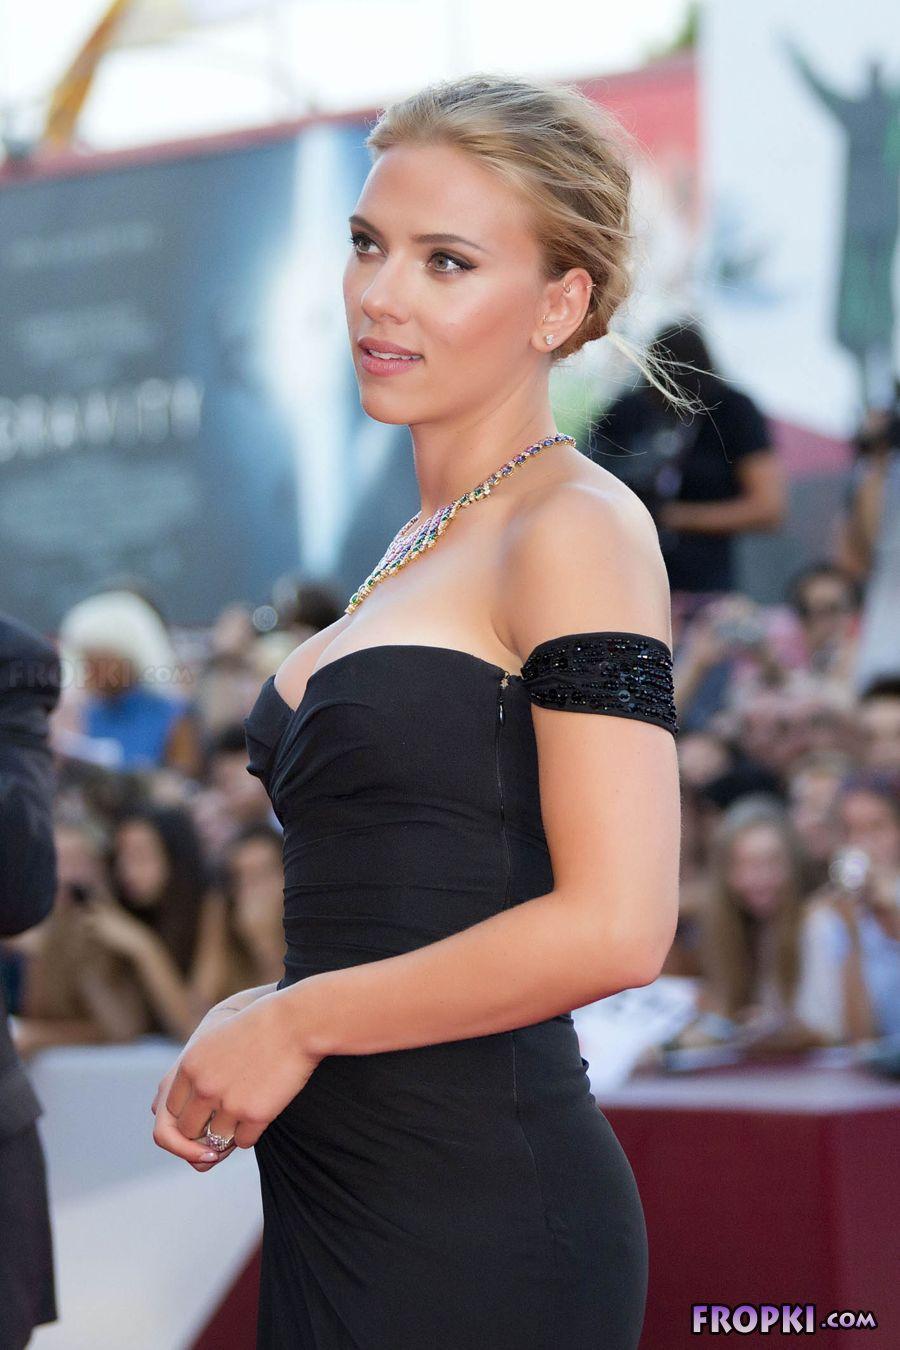 Scarlett Johansson Fropki 11